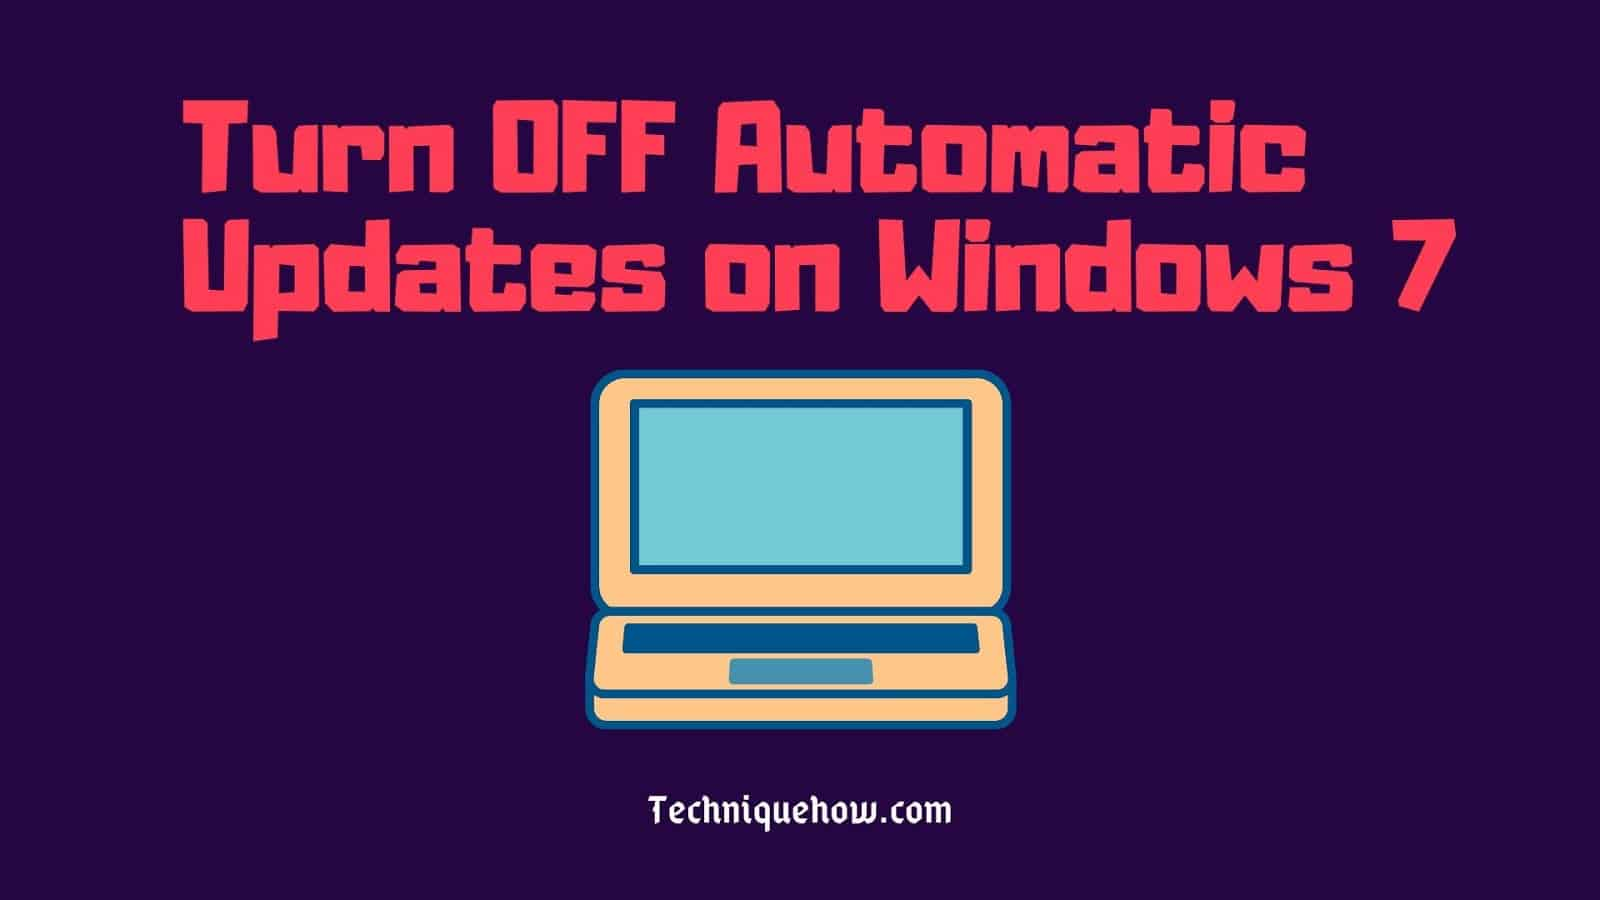 Turn off Automatic Updates on Windows